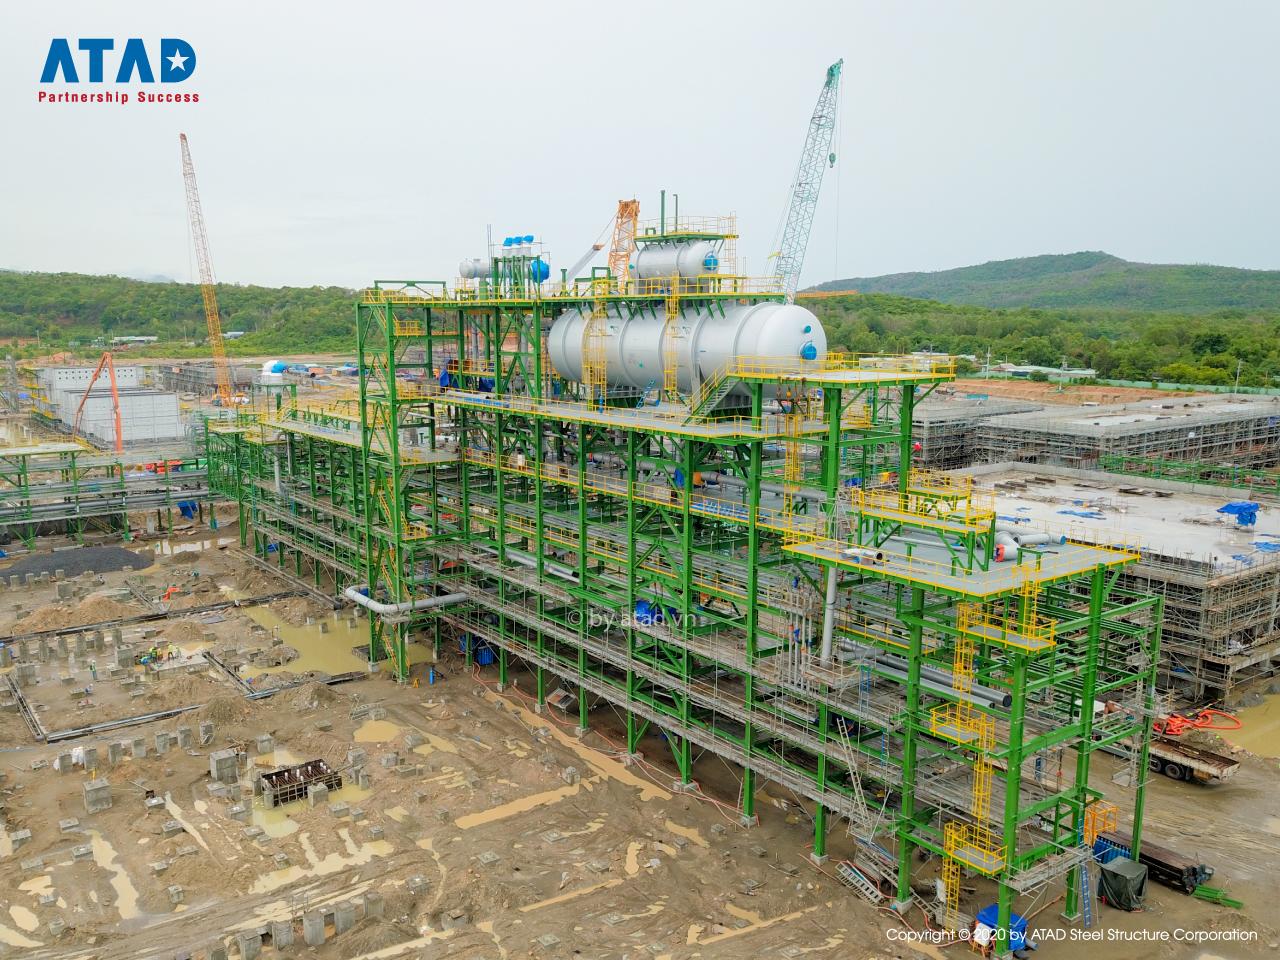 ATAD implemented Long Son Petrochemicals Complex, Ba Ria - Vung Tau 1